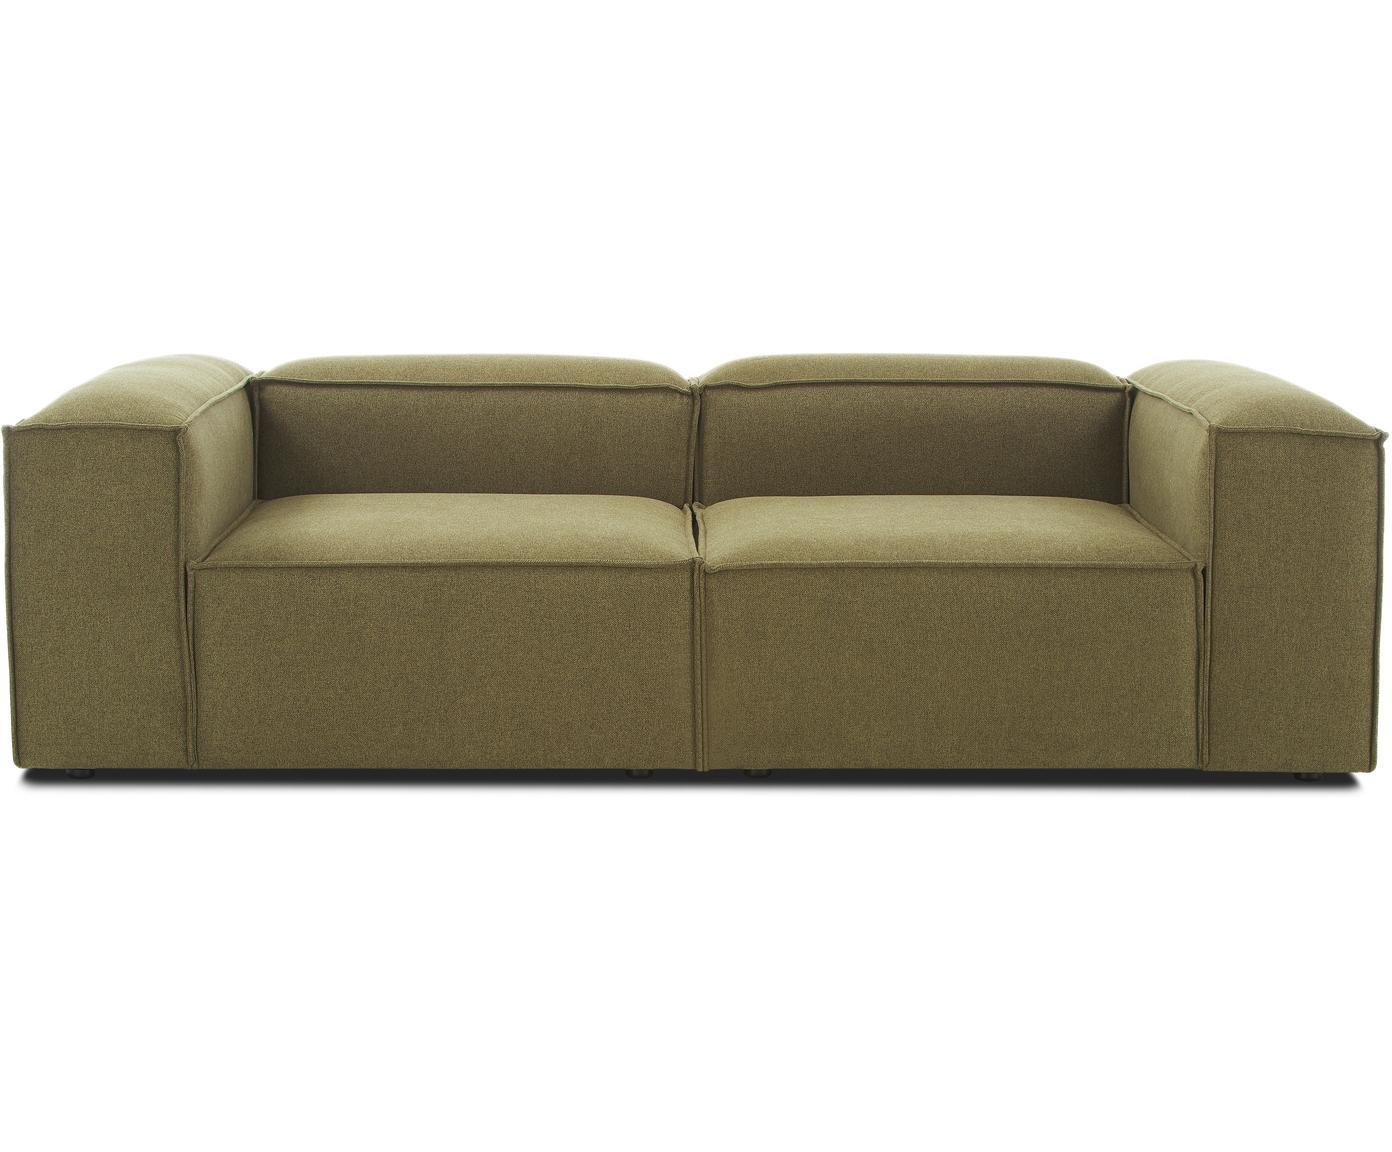 Modulares Sofa Lennon (3-Sitzer), Bezug: 100% Polyester 35.000 Sch, Gestell: Massives Kiefernholz, Spe, Füße: Kunststoff, Webstoff Grün, B 238 x T 119 cm